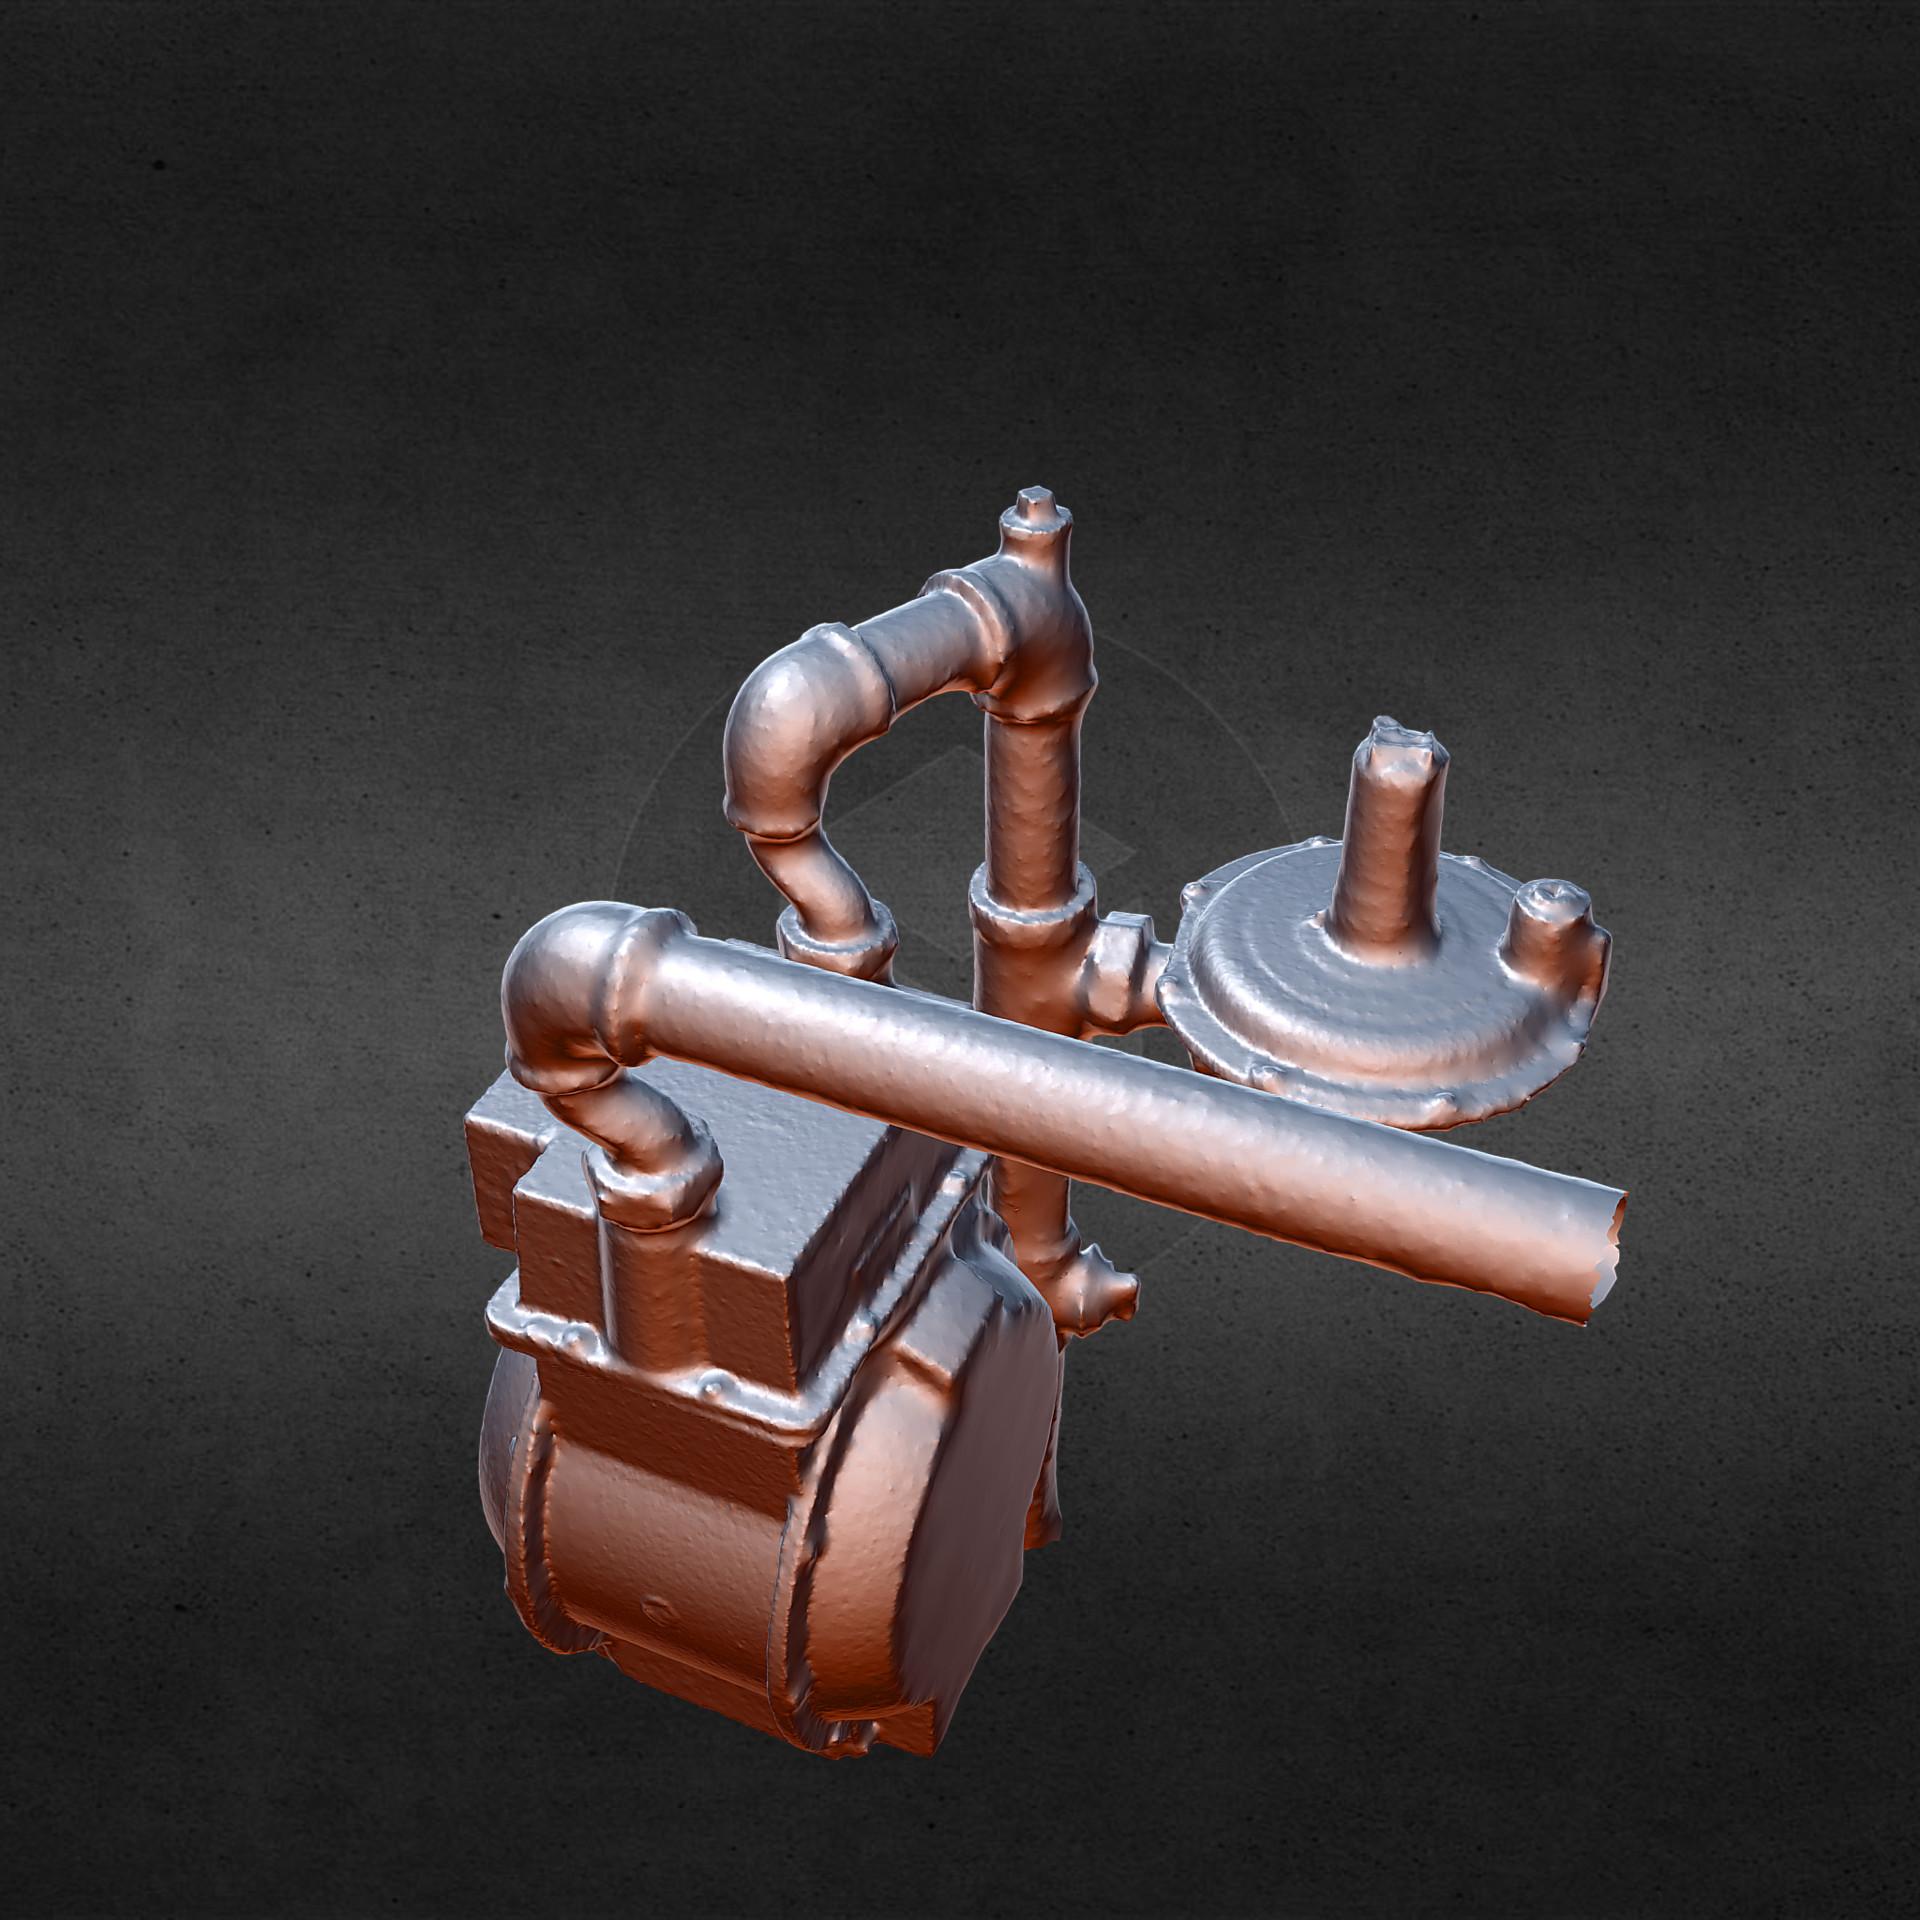 Andre bond gas meter 4